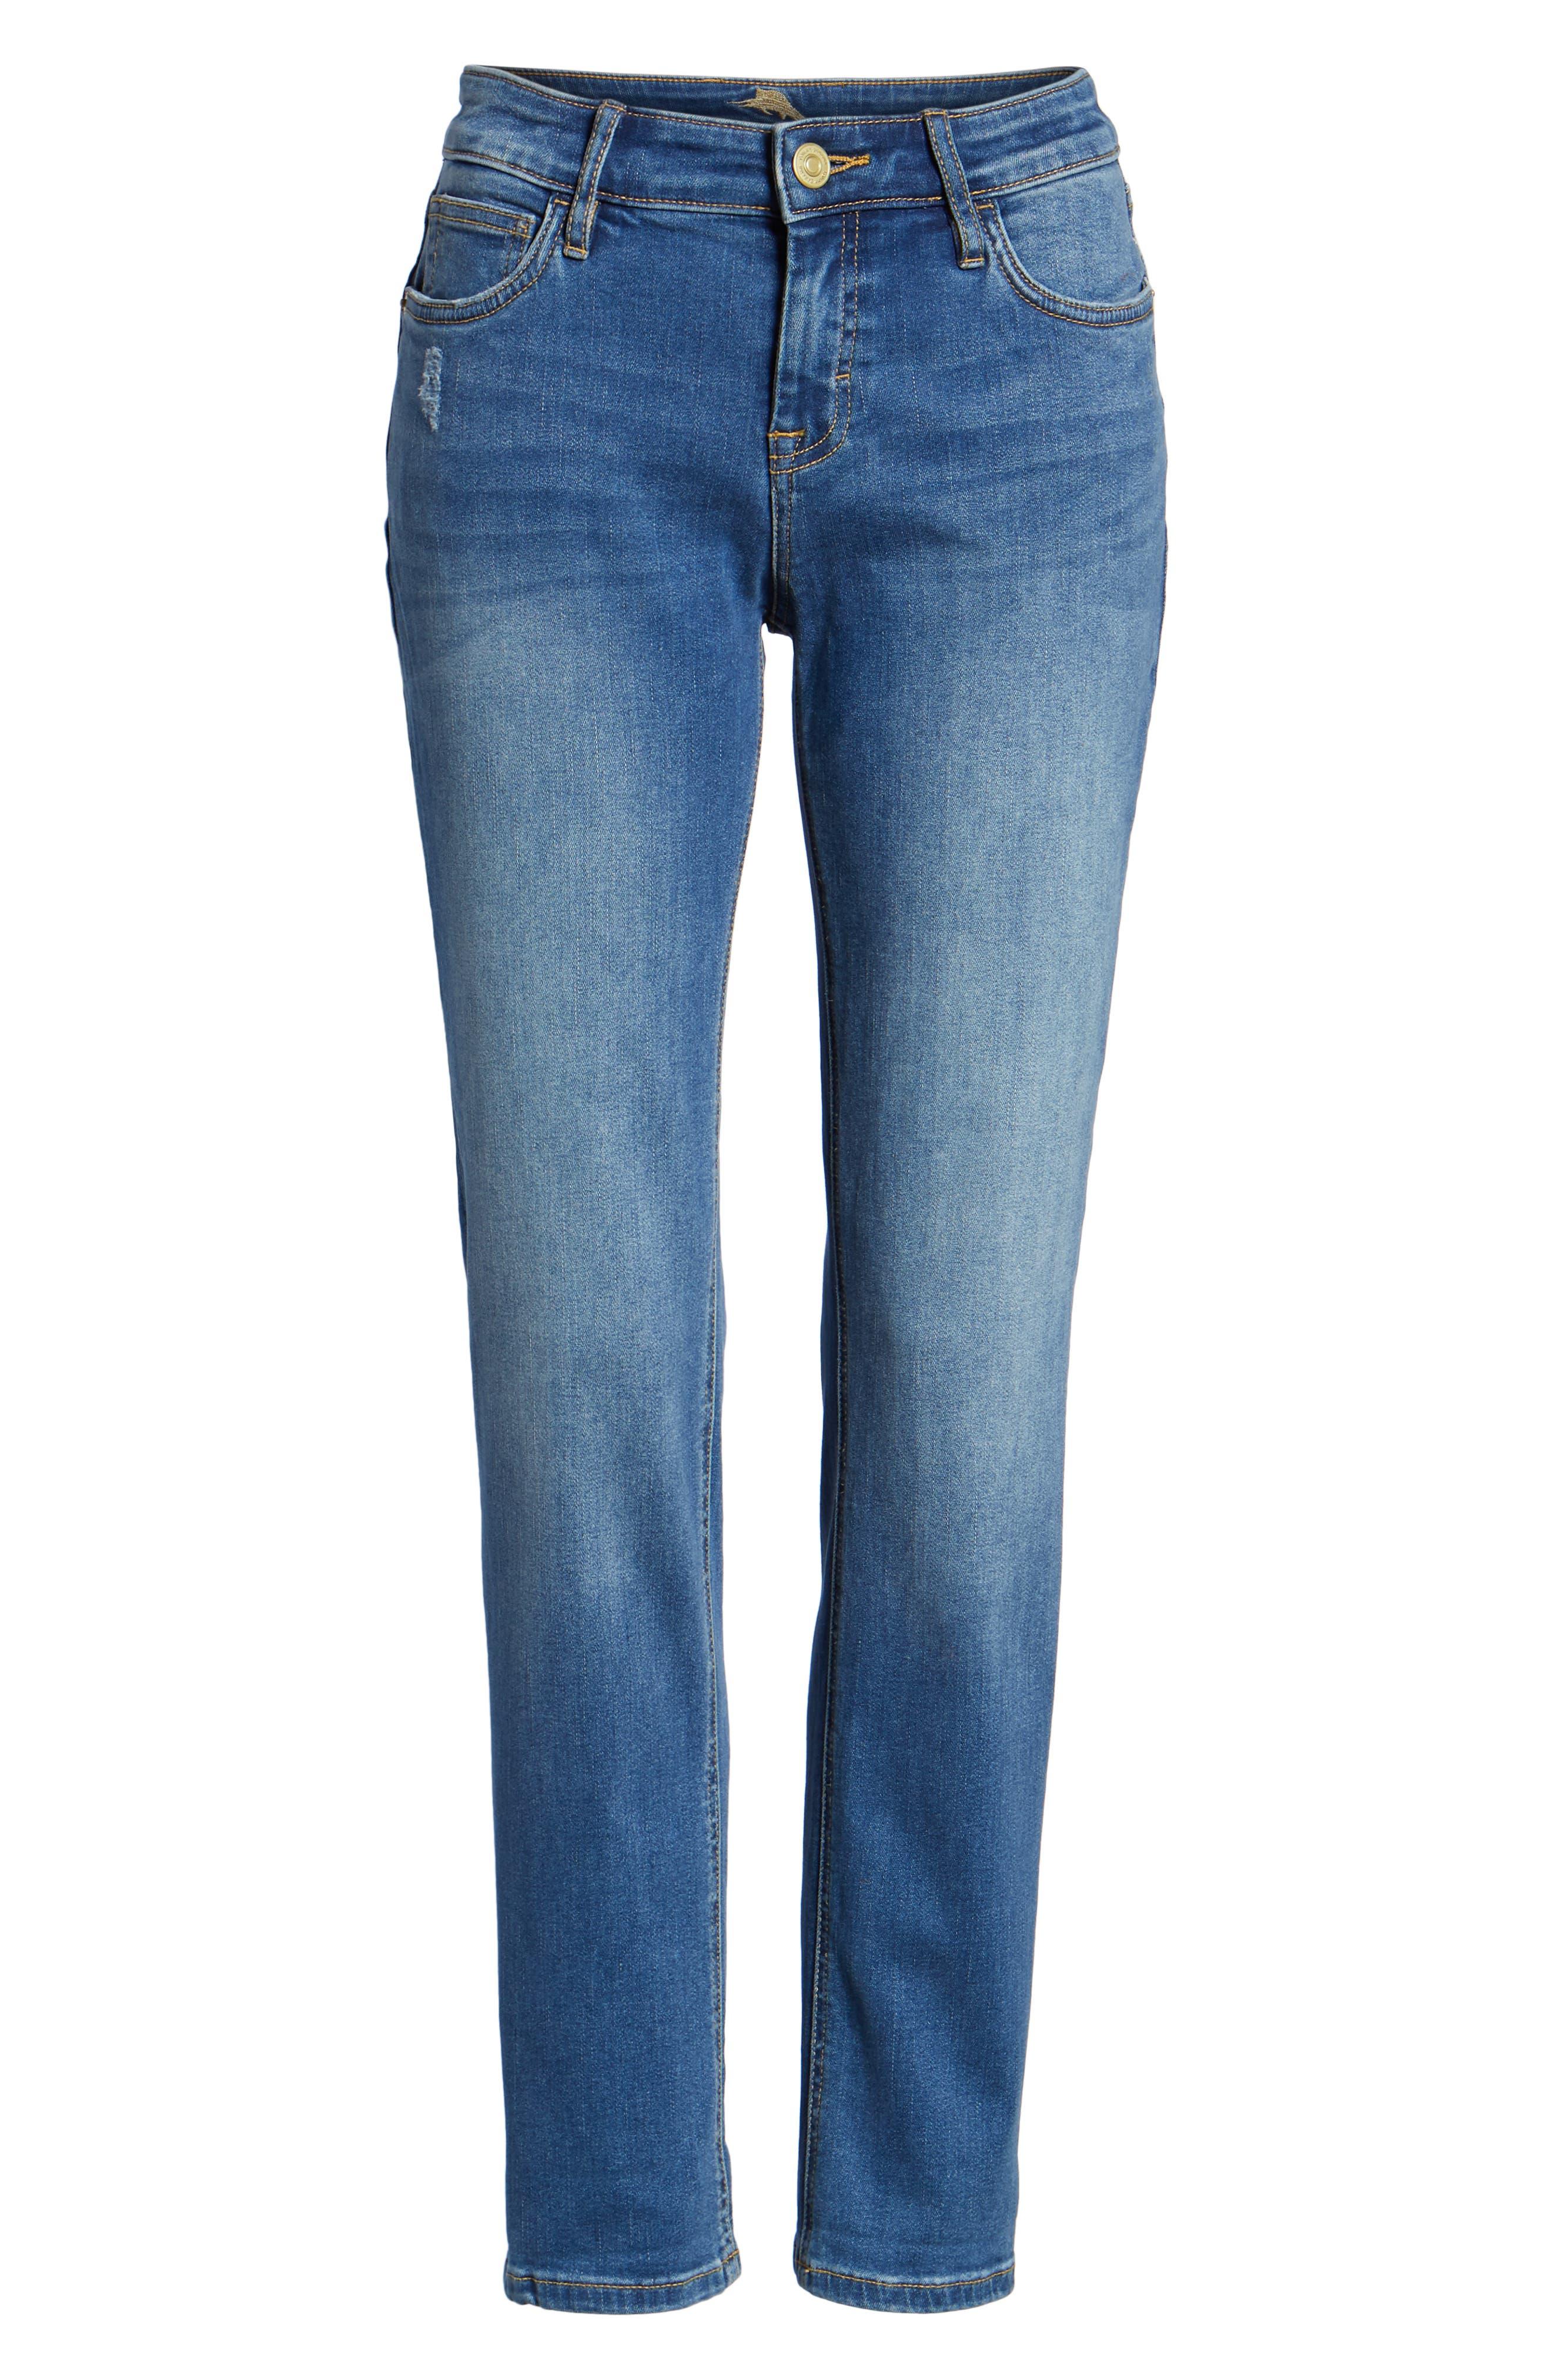 Tema Slim Boyfriend Jeans,                             Alternate thumbnail 17, color,